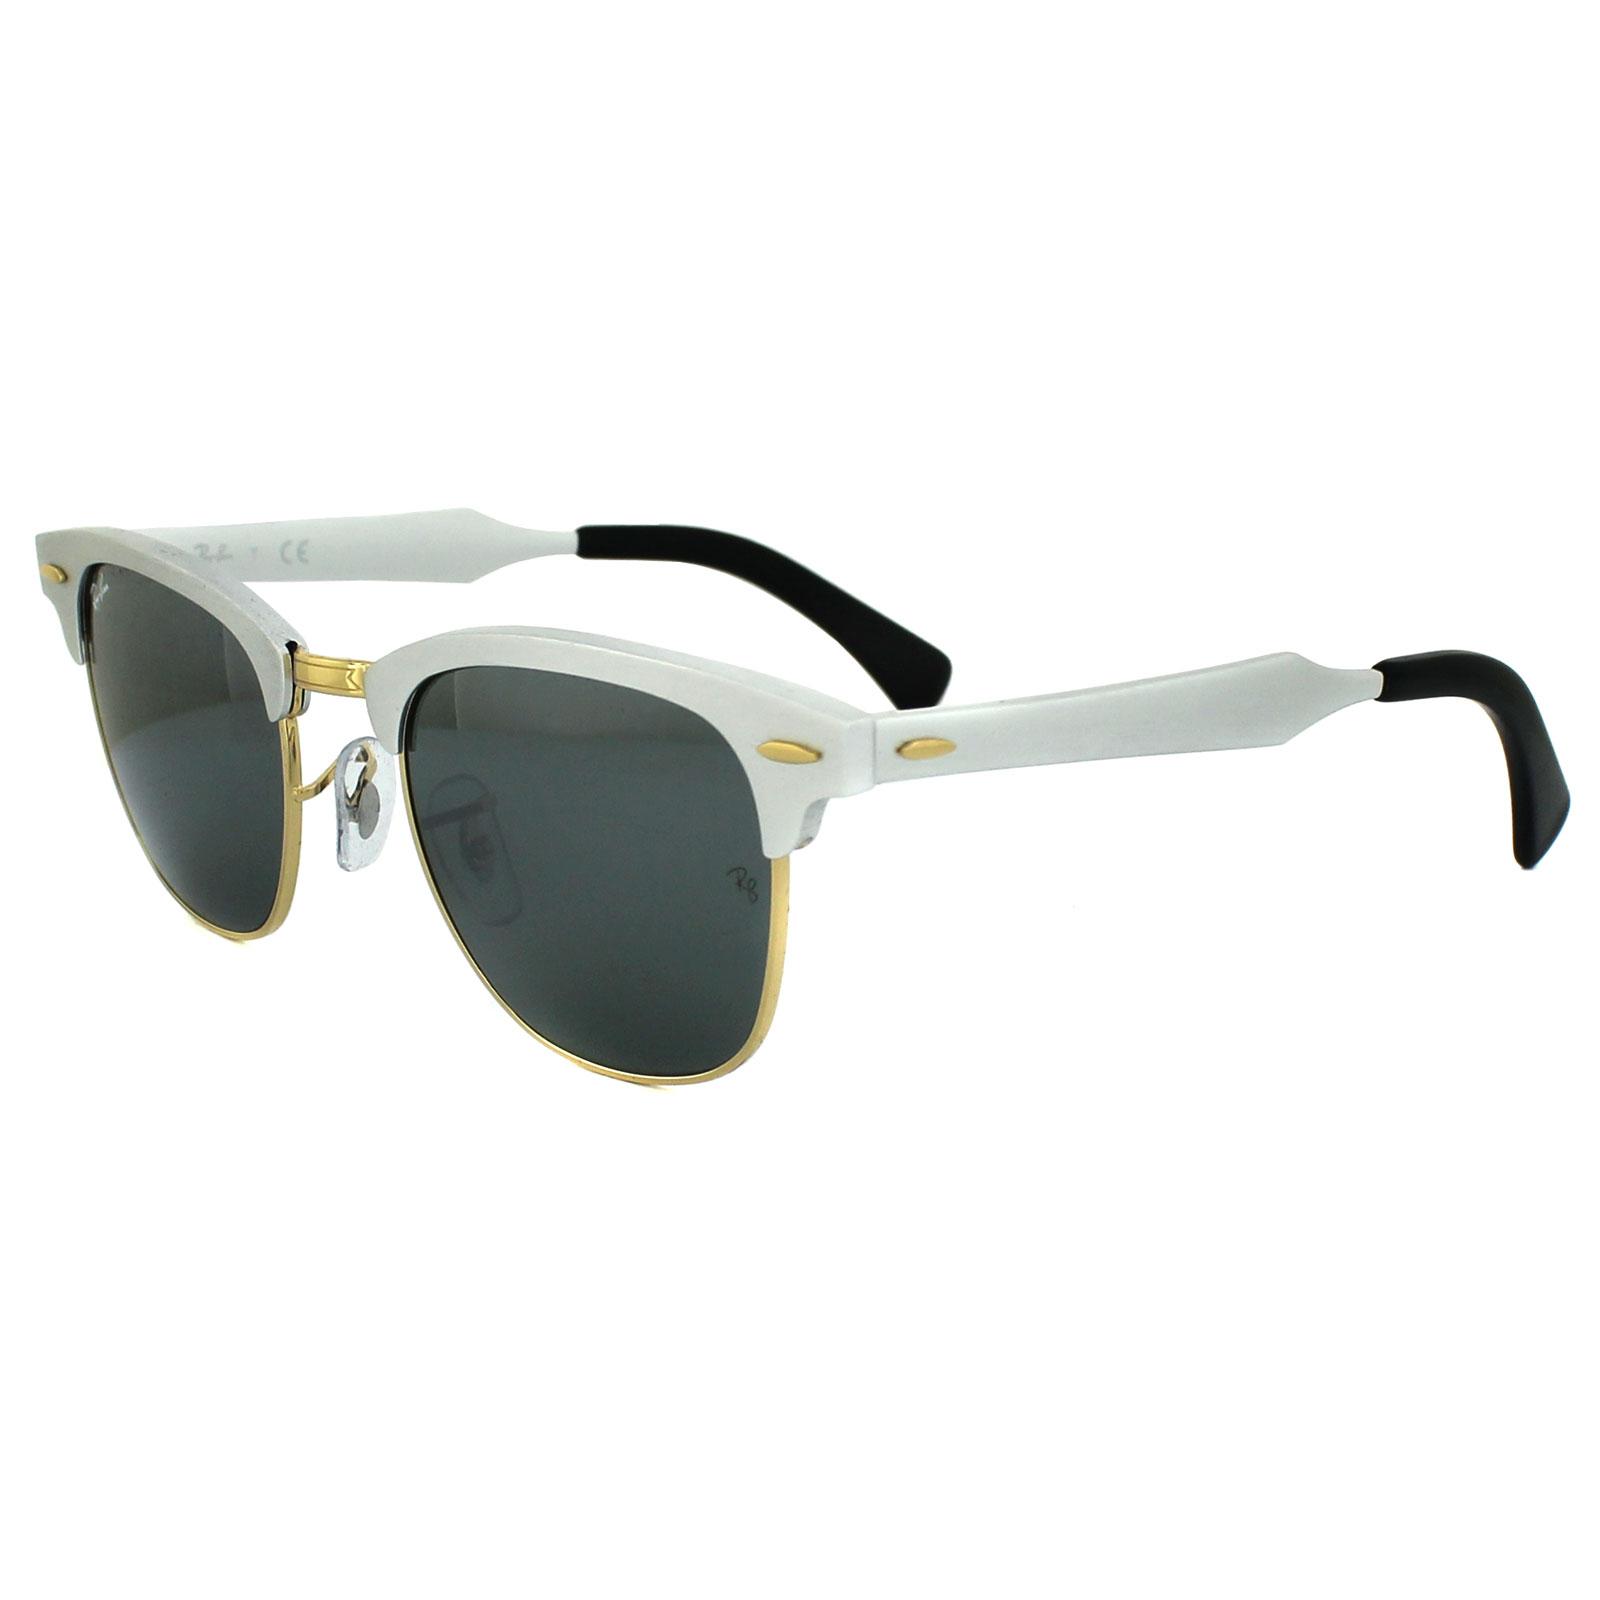 Sentinel Ray-Ban Sunglasses Clubmaster Aluminium 3507 137 40 Silver Silver  Mirror f9b886d76c9b